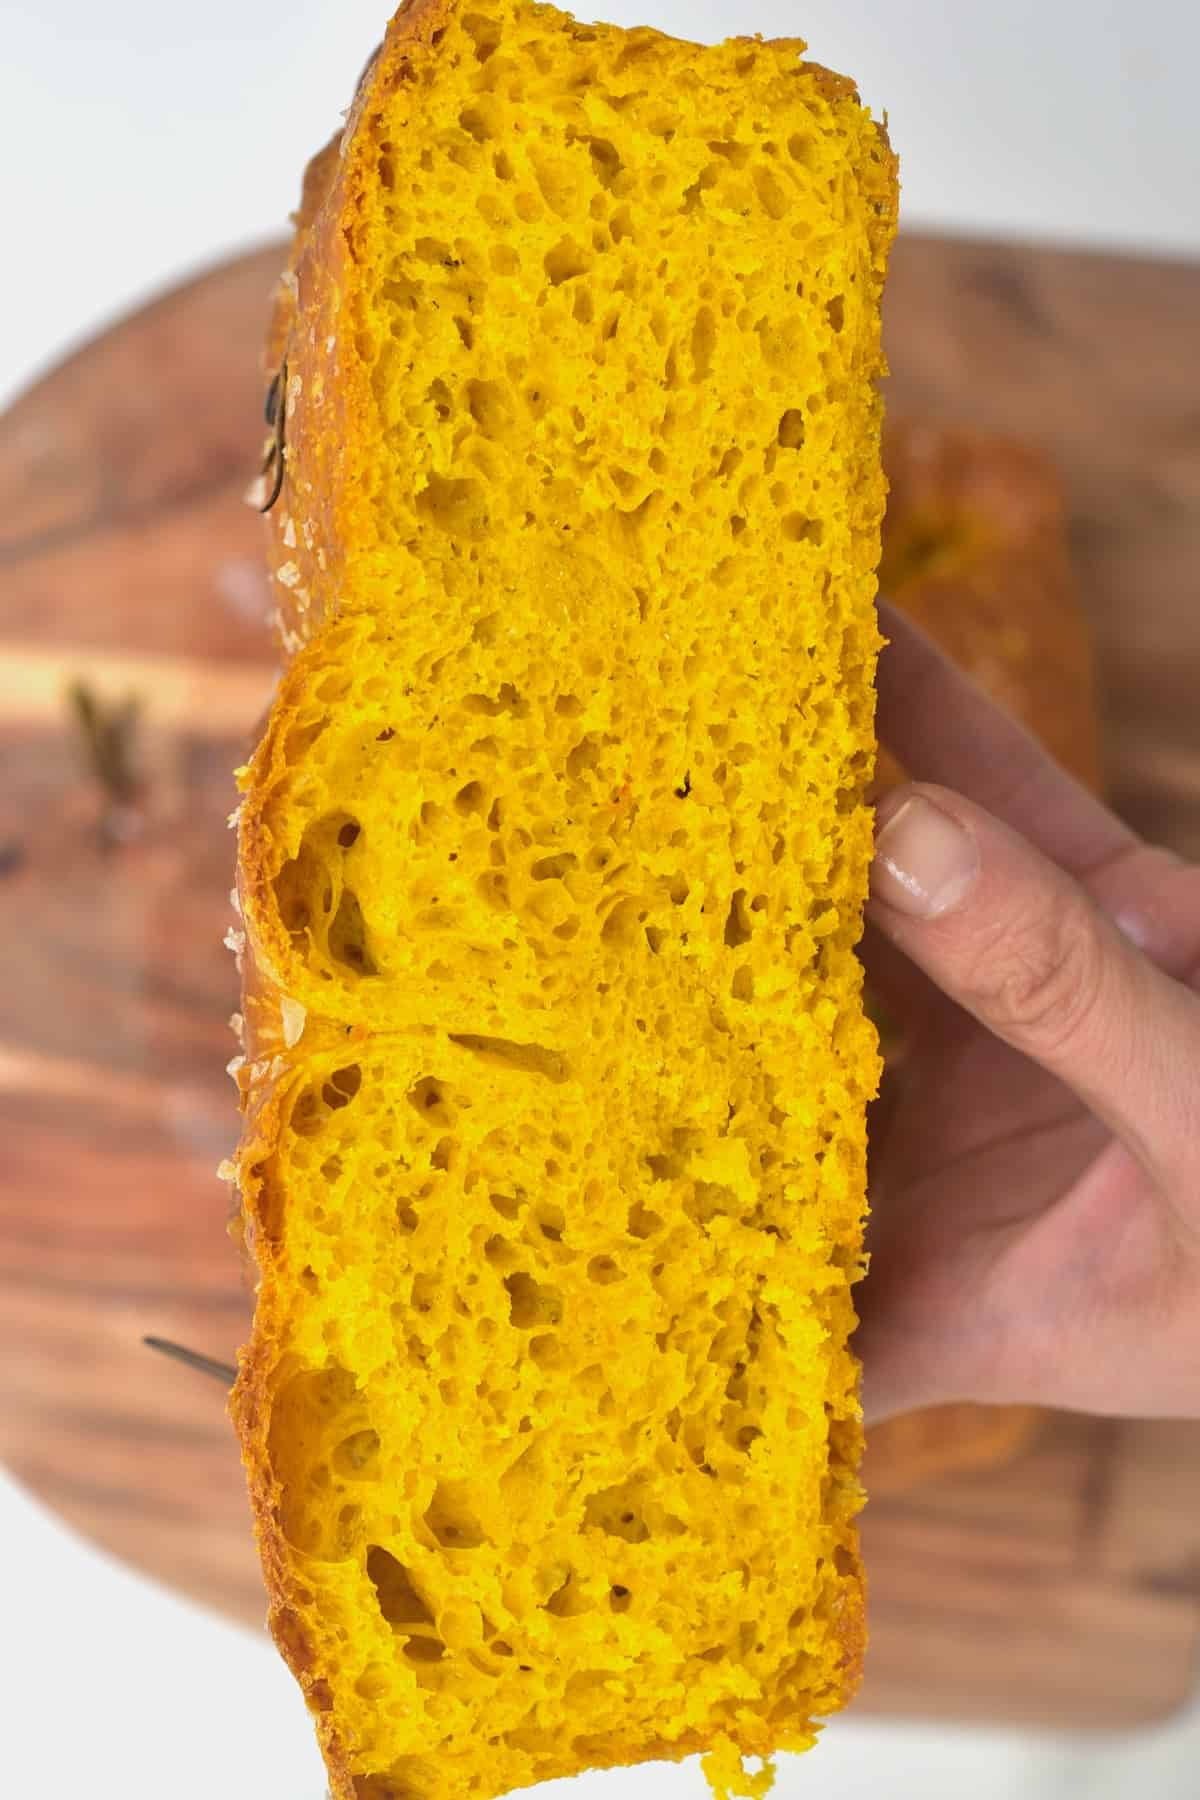 A slice of turmeric focaccia